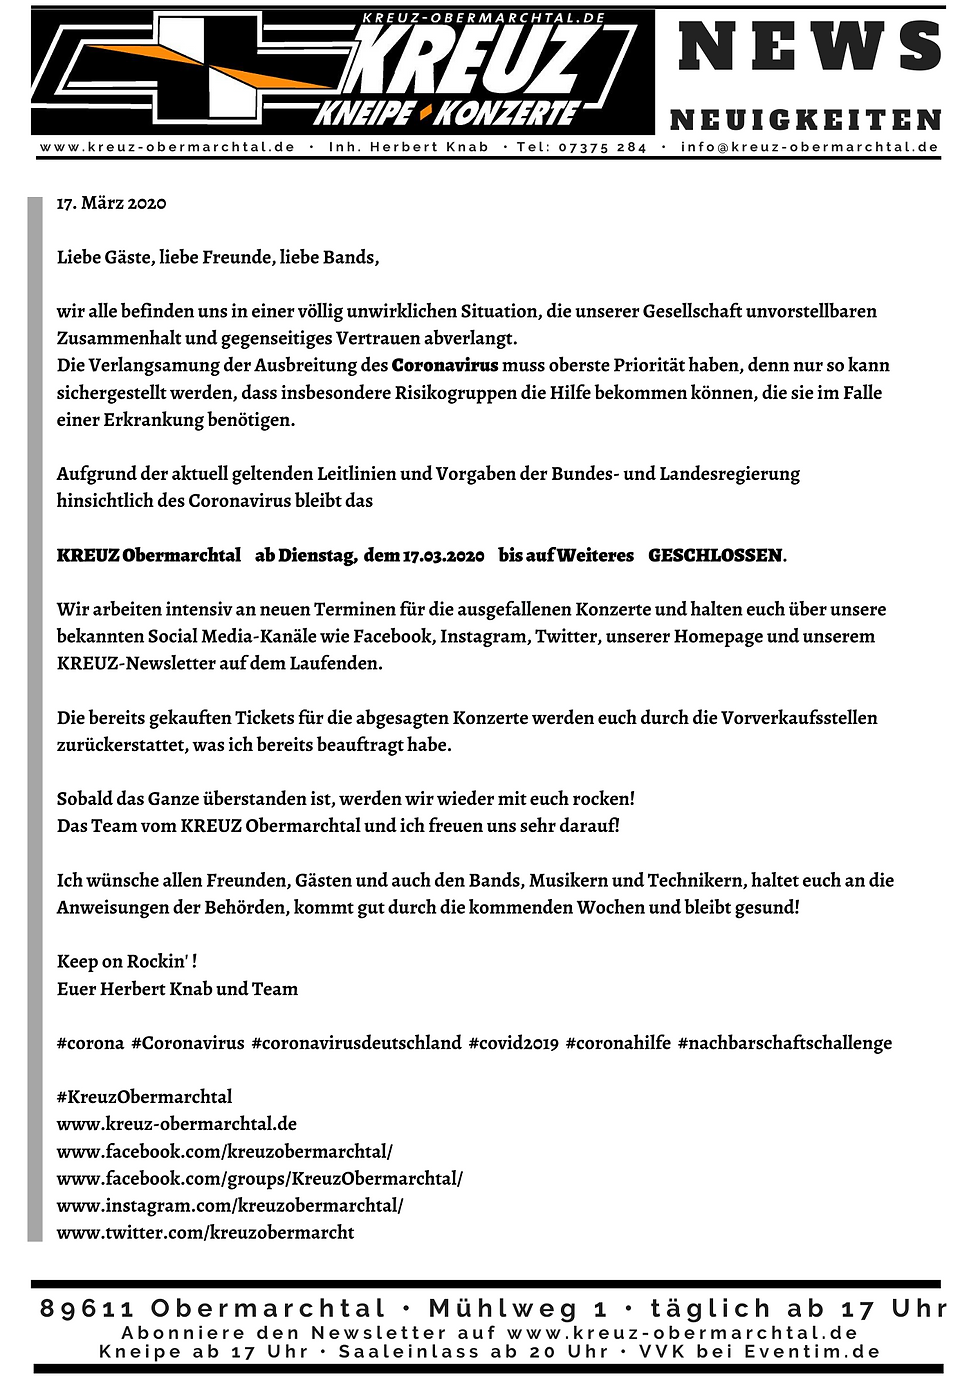 KREUZ_Schließung.png